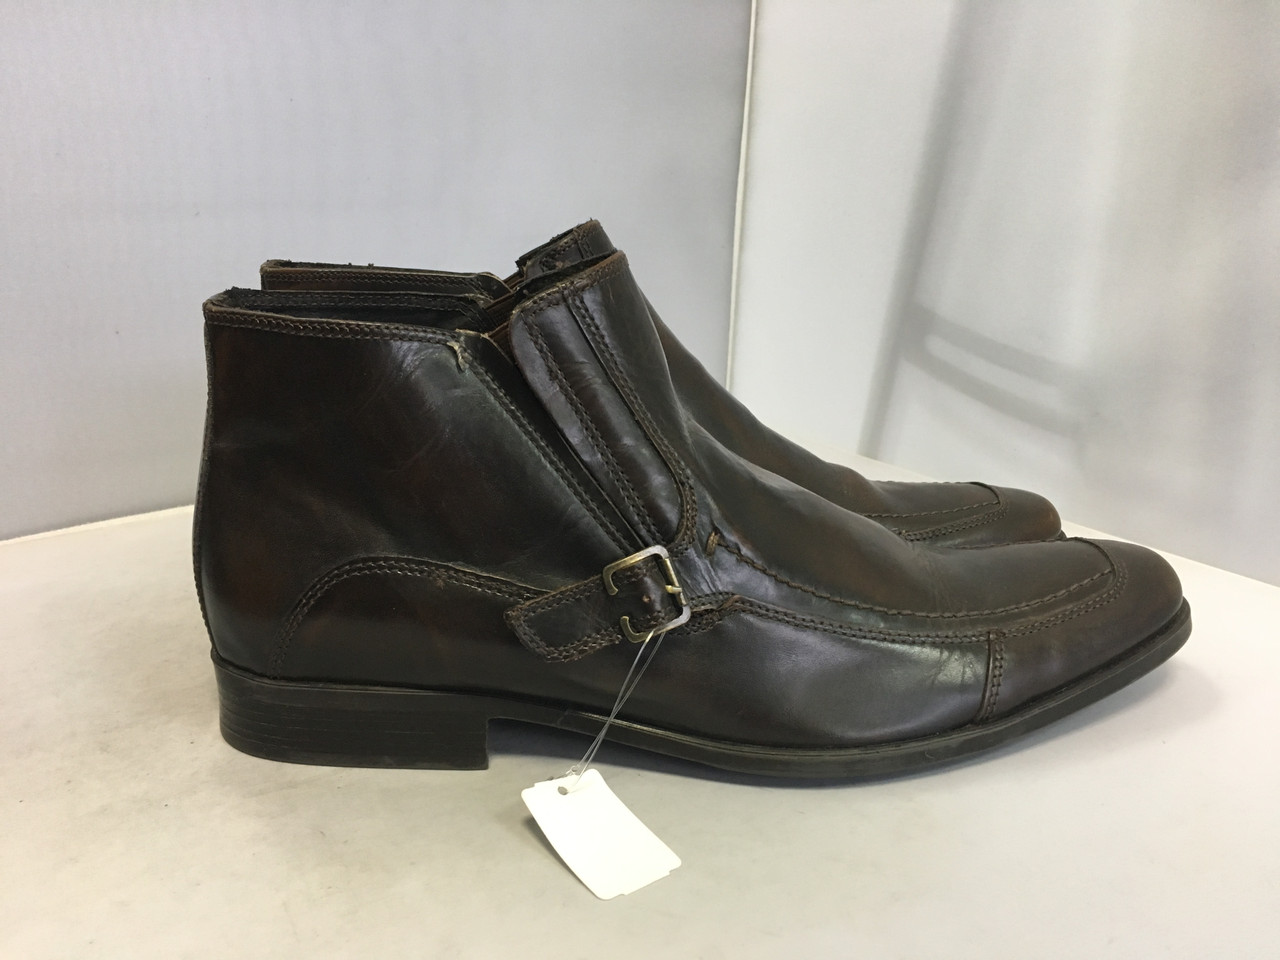 Мужские ботинки Coleridge, 45 размер